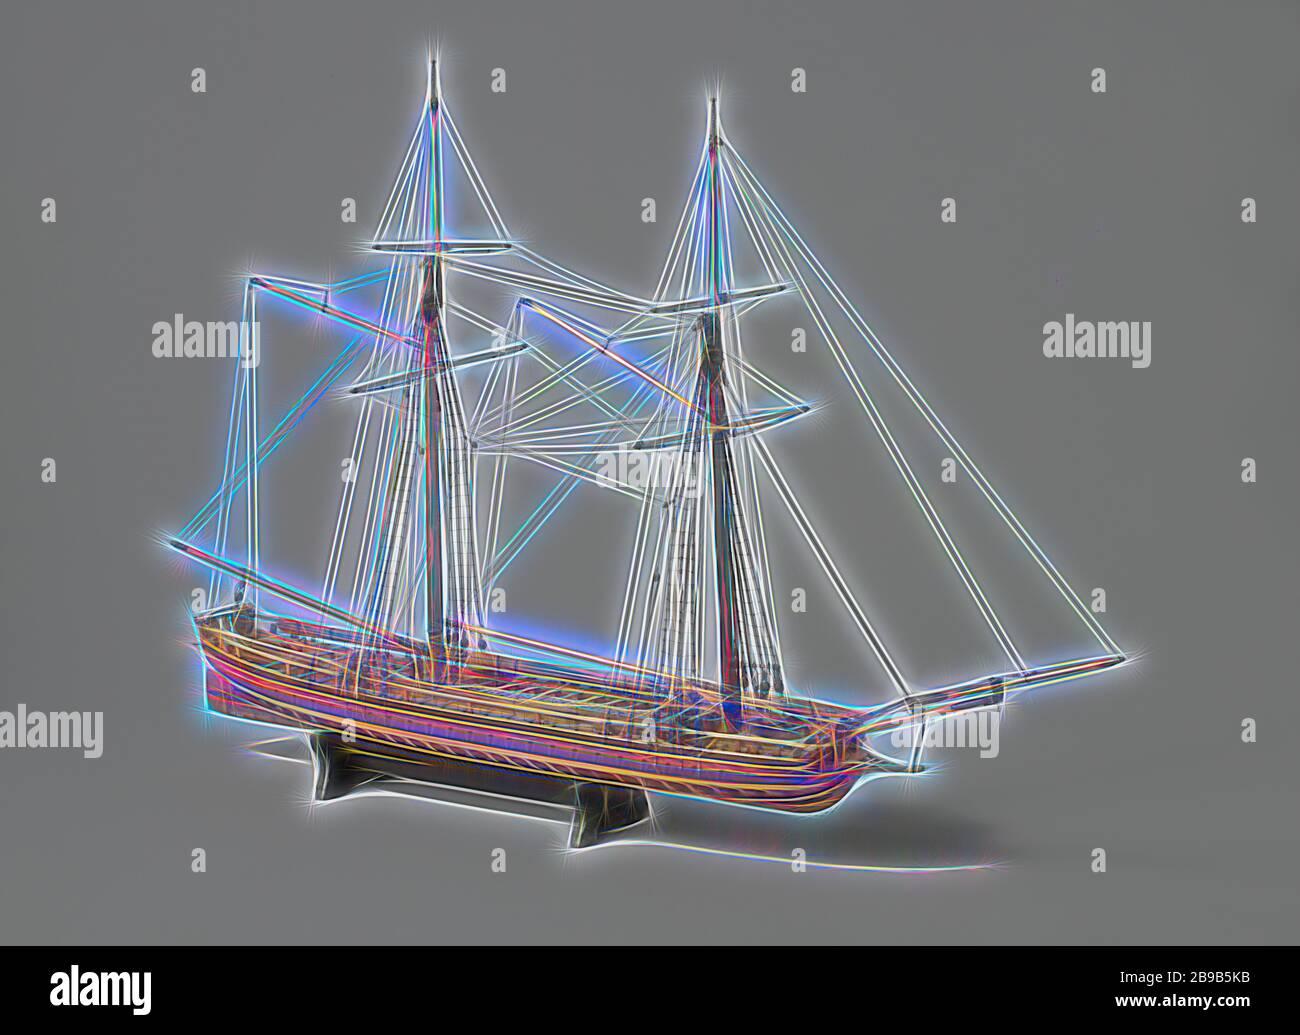 STARBOARD Metal Sign Nautical BAR Shop Sail Fishing Boat Dock Yacht Ship Marina